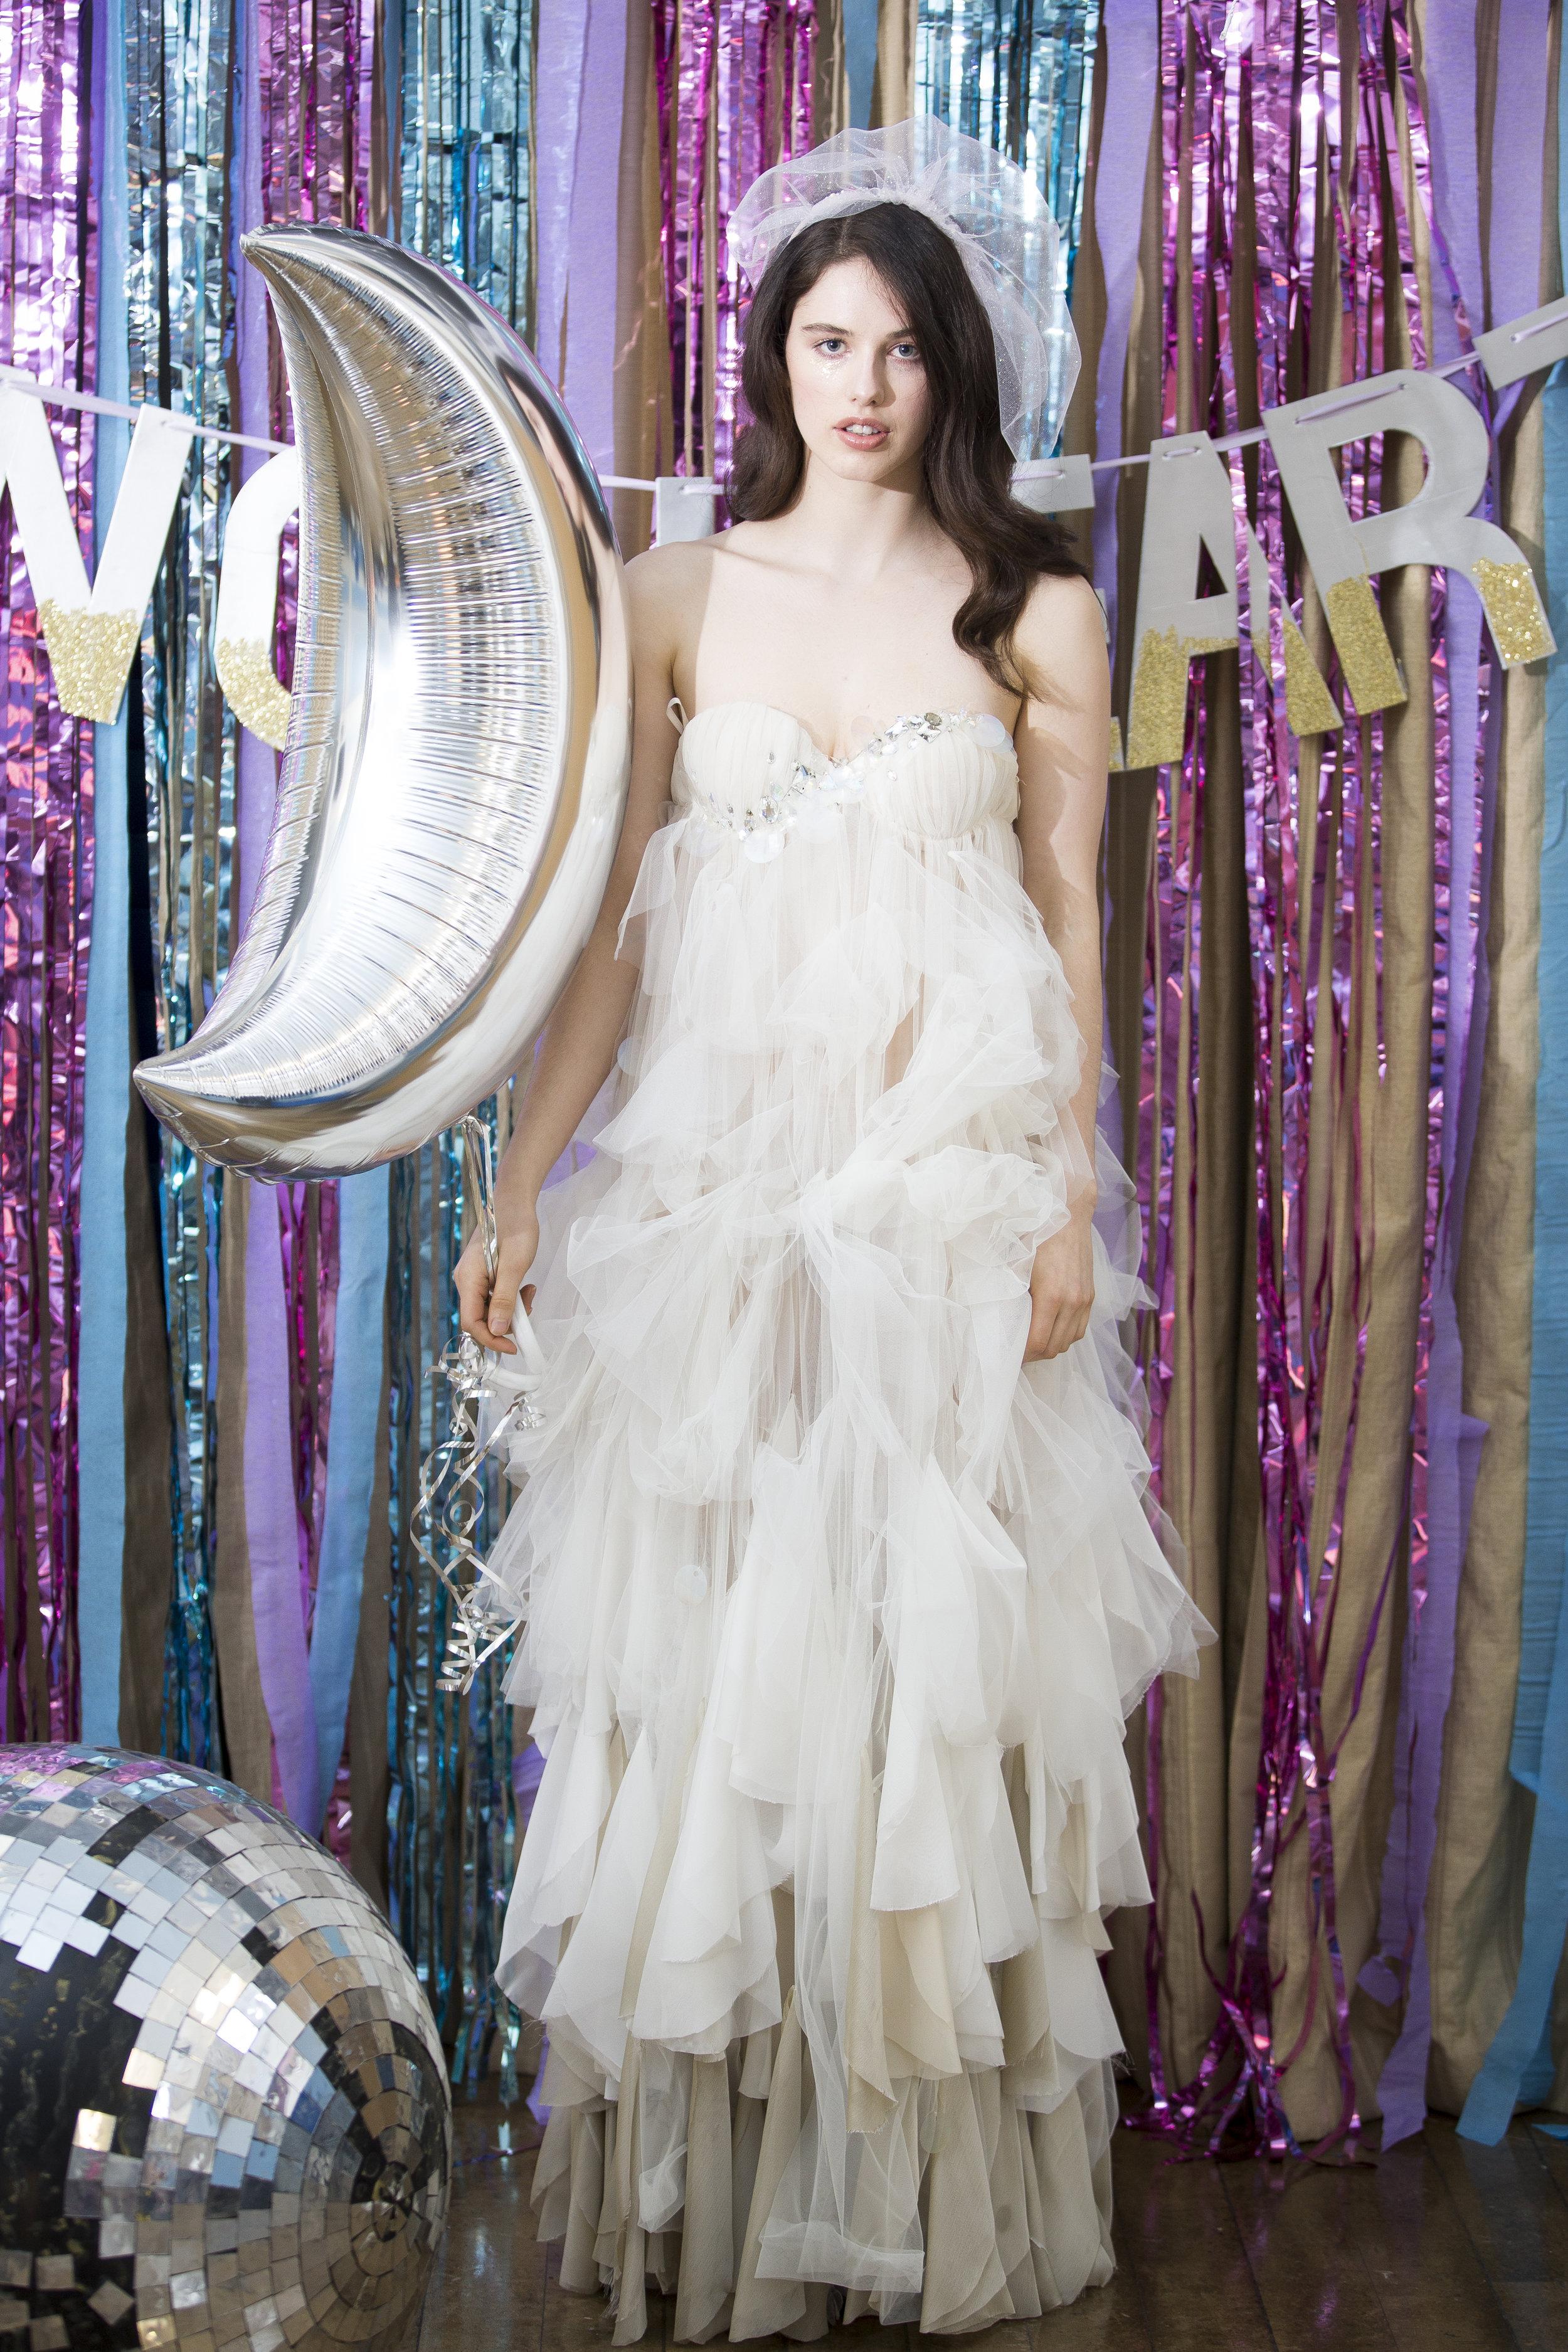 Prom Night Wedding Shoot Meadham Kirchhoff Carrie 00057.jpg